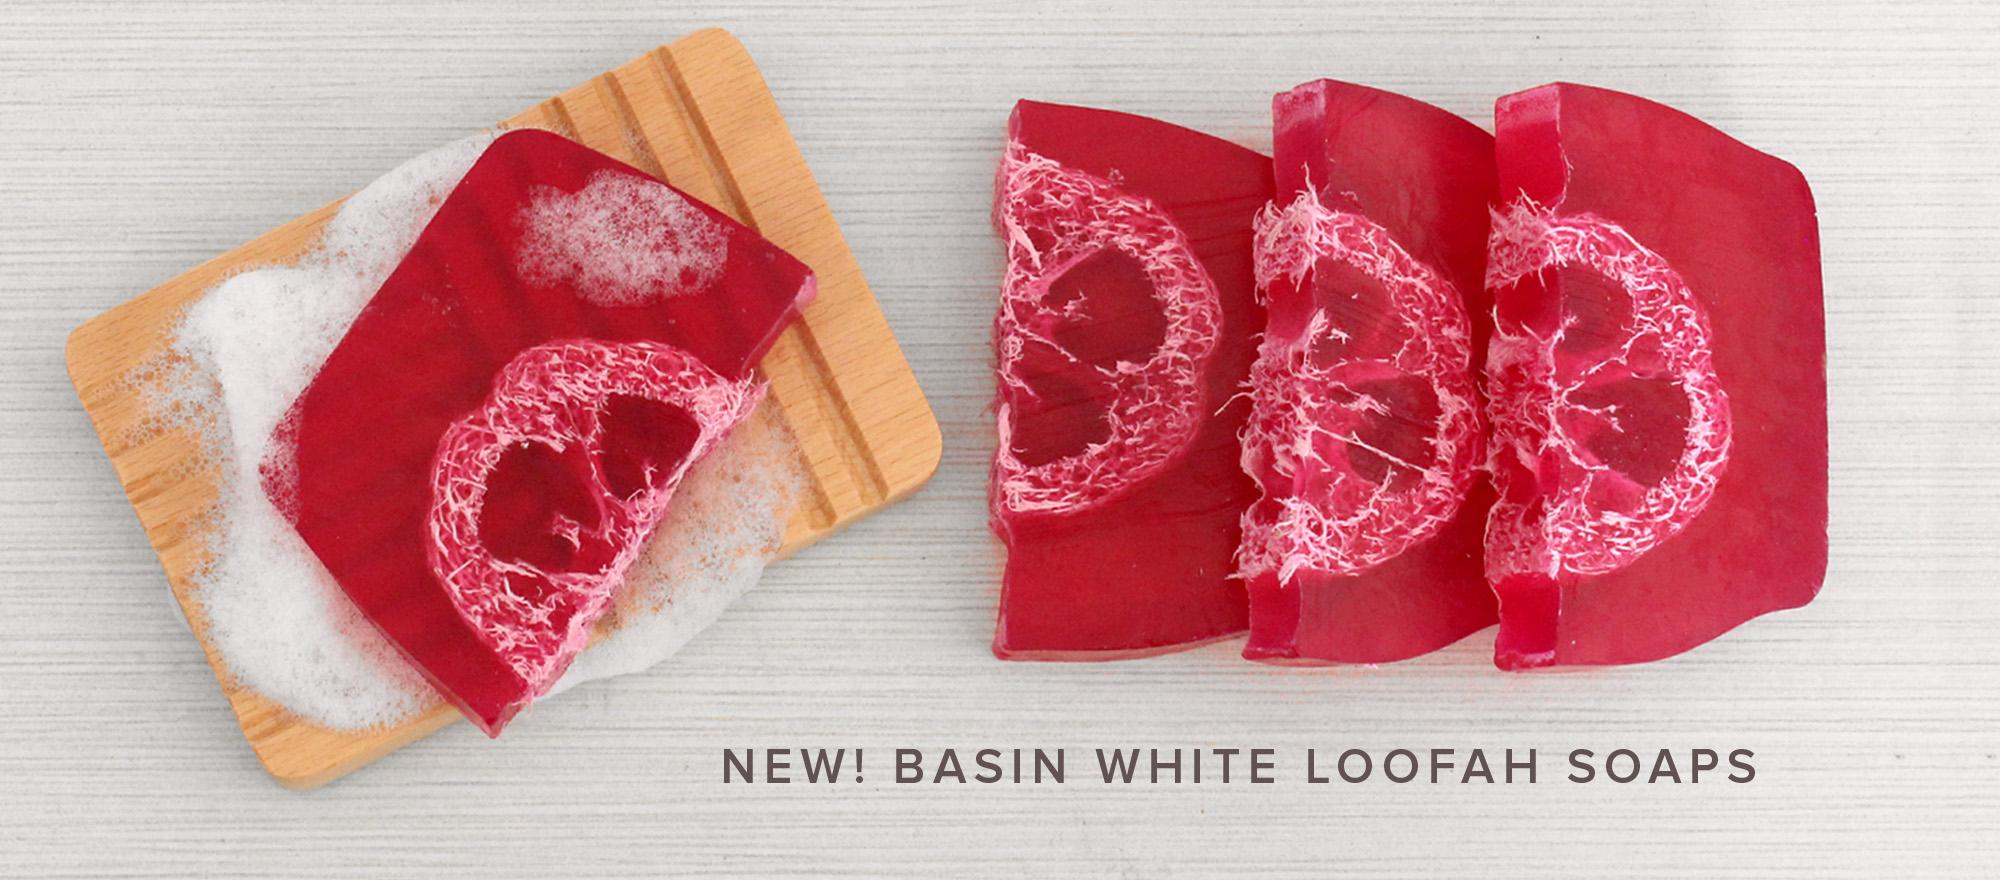 NEW Basin White Loofah Soaps